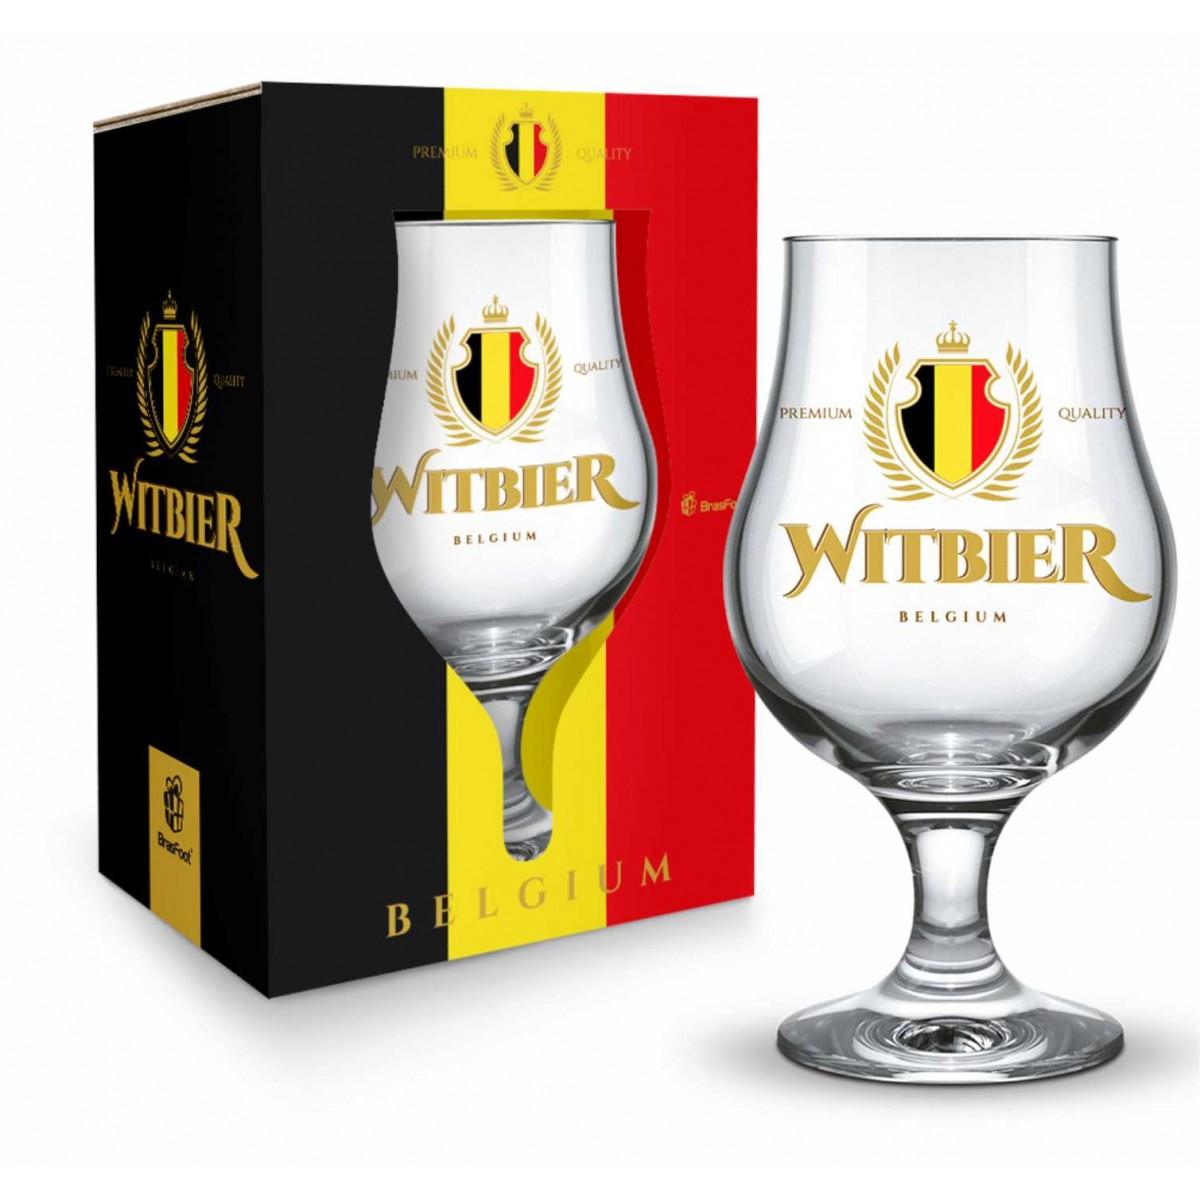 Taça Dublin 400ml - Bélgica Witbier Presente Brasfoot